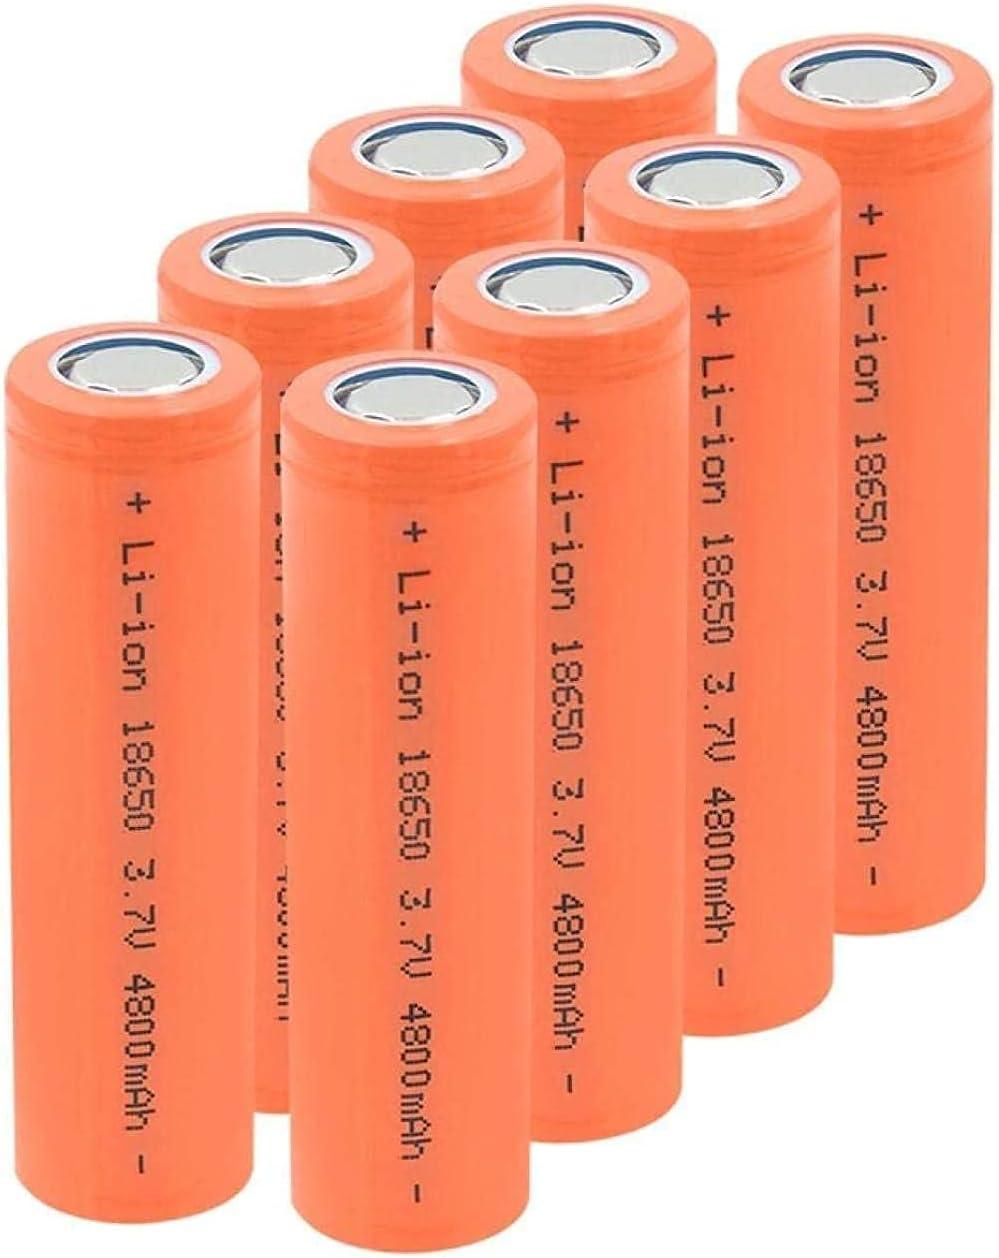 Rechargeable Battery 3.7V 4800Mah Batt 18650 shipfree cheap Li-Ion